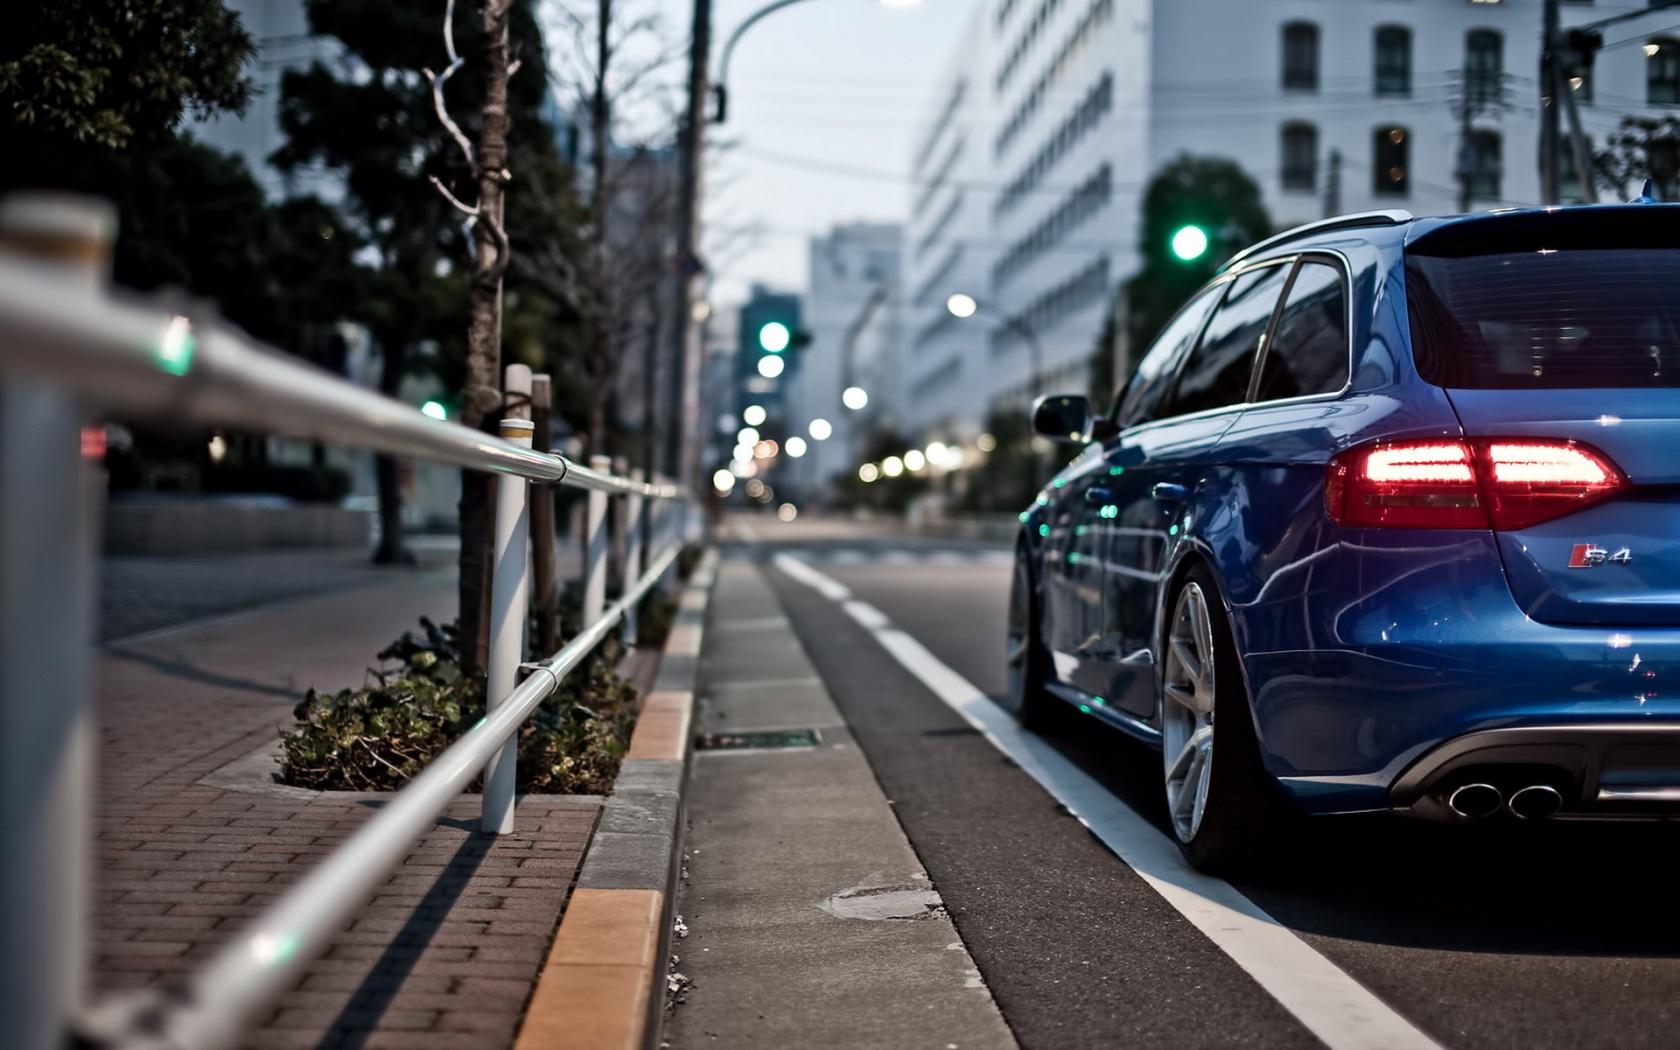 Audi S4 Wallpaper Hd 43860